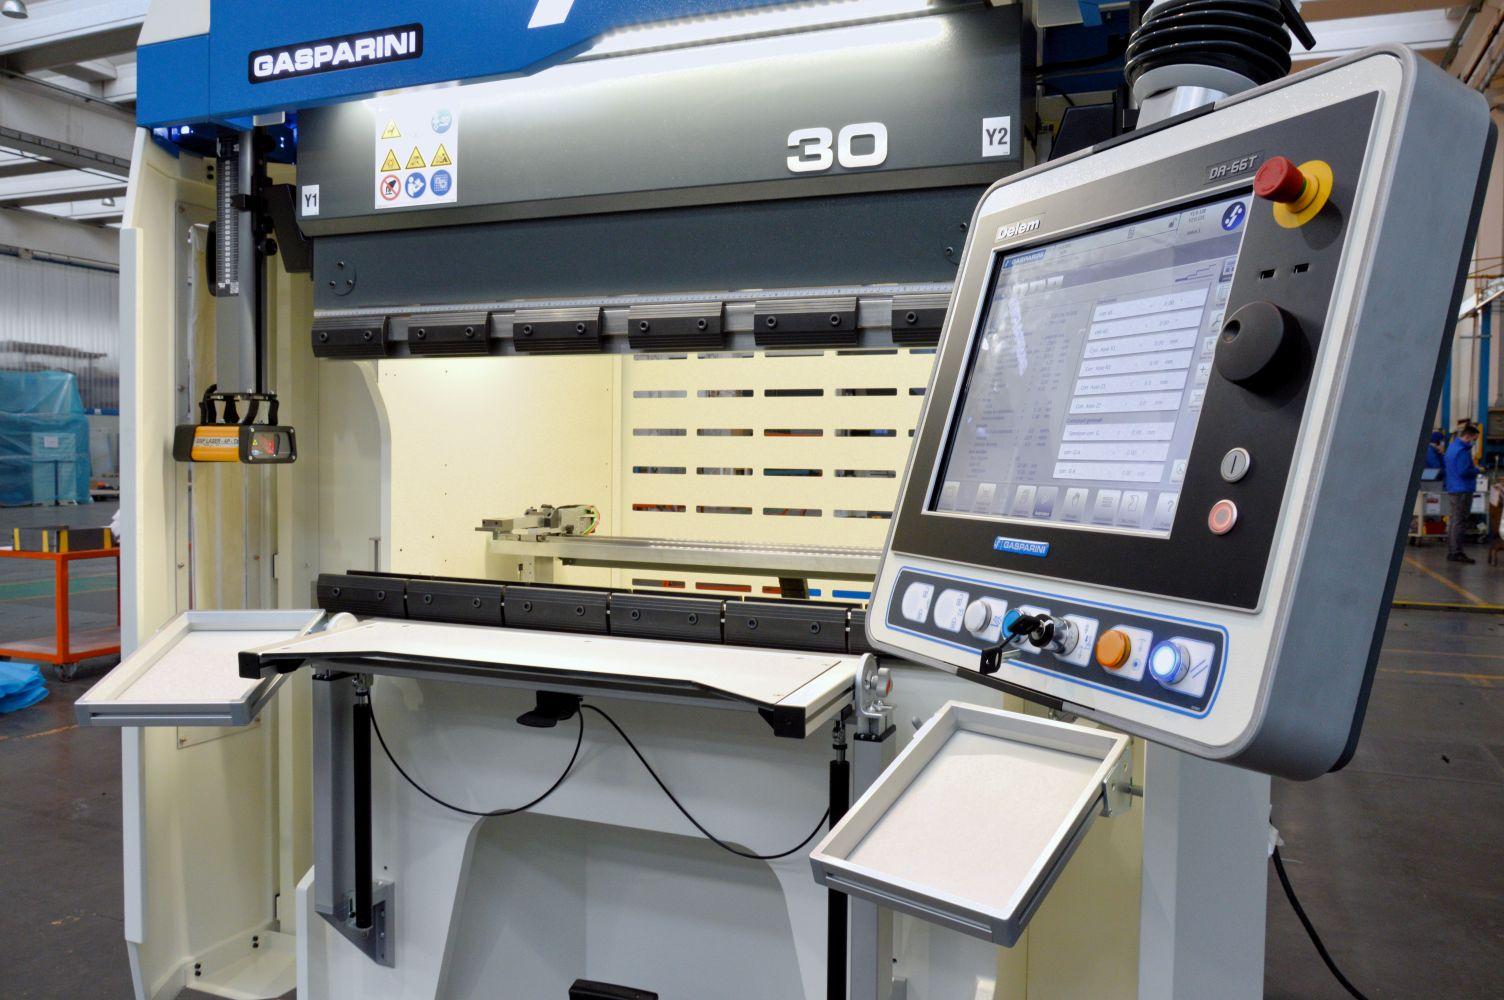 prensa plegadora cnc industria 4.0 fábrica inteligente